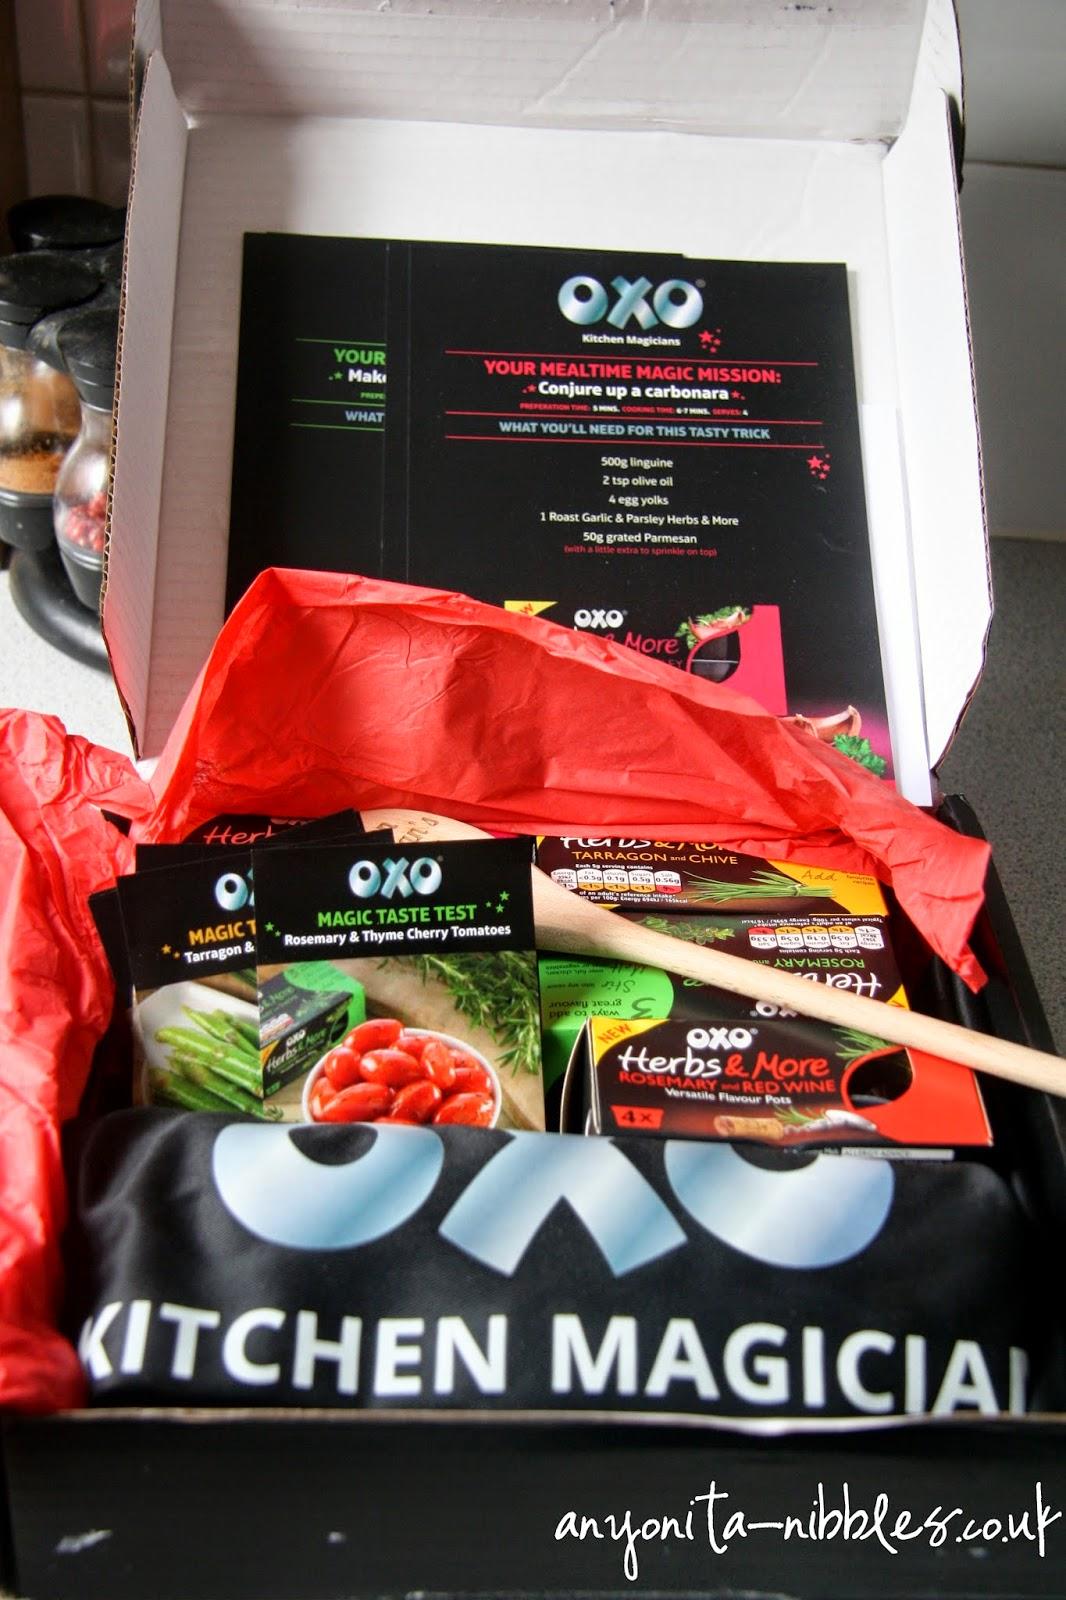 OXO Kitchen Magician Kit from Anyonita-nibbles.co.uk